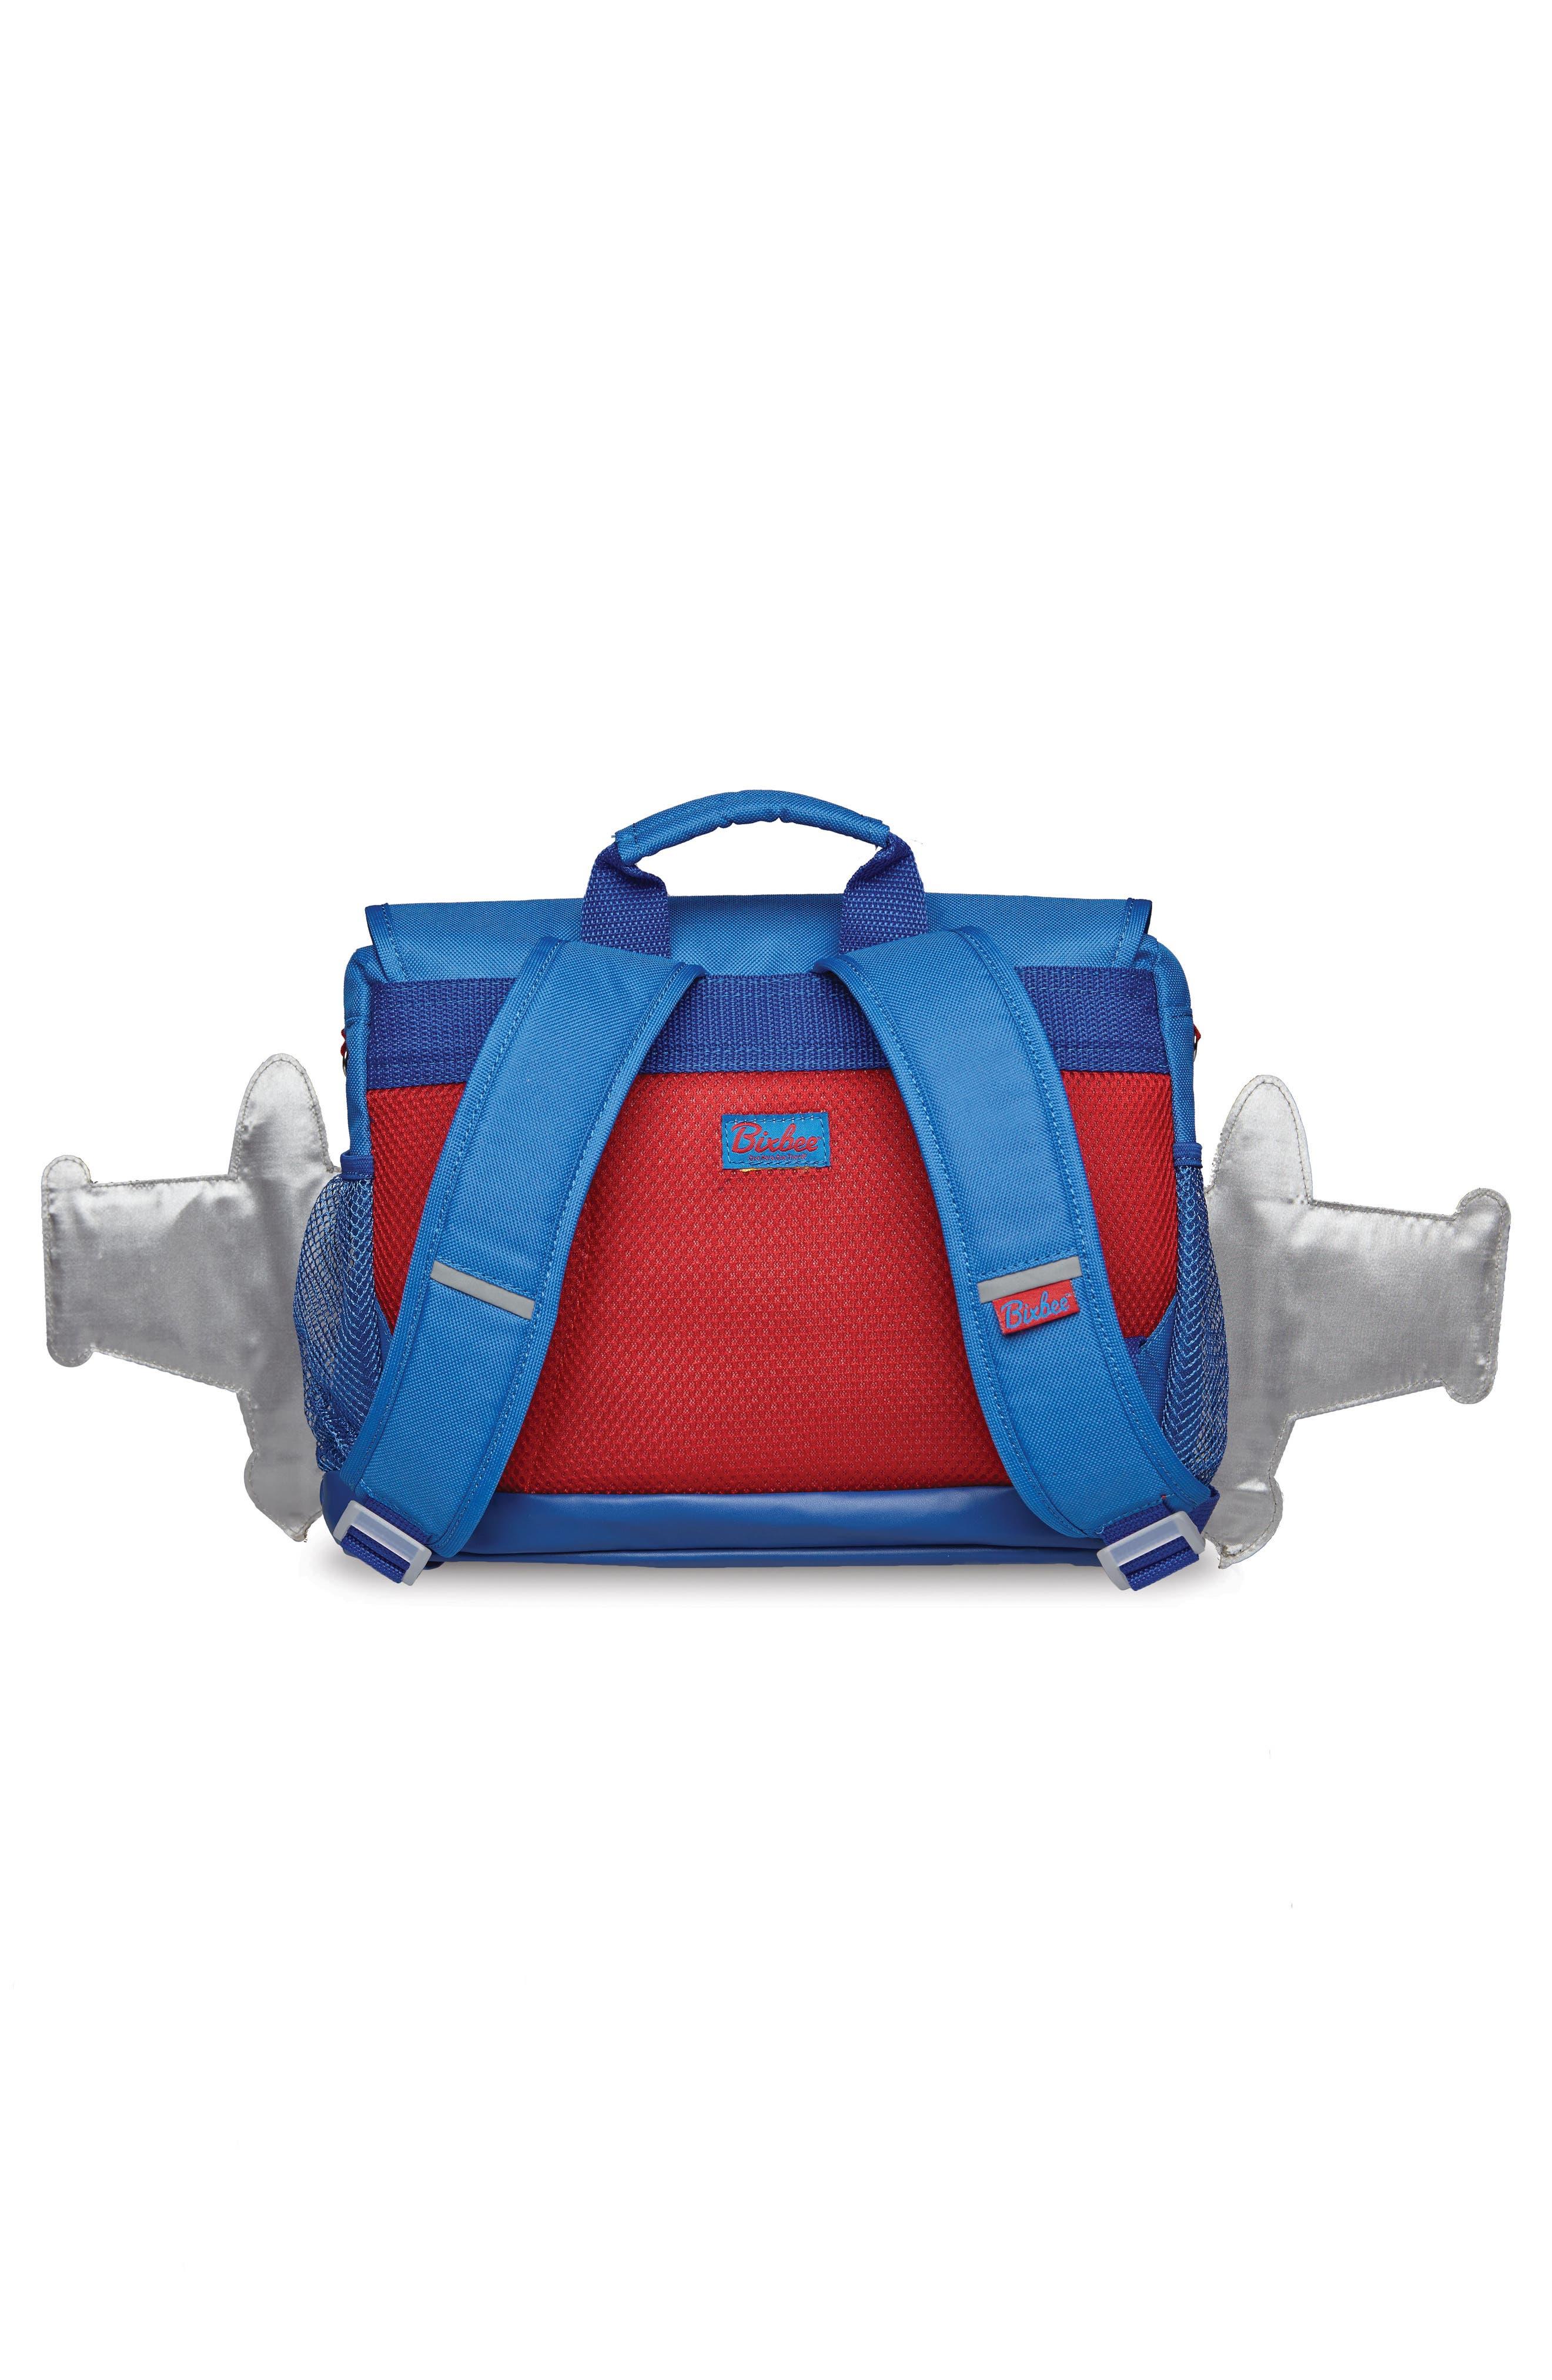 Rocketflyer Water-Resistant Backpack,                             Alternate thumbnail 2, color,                             400